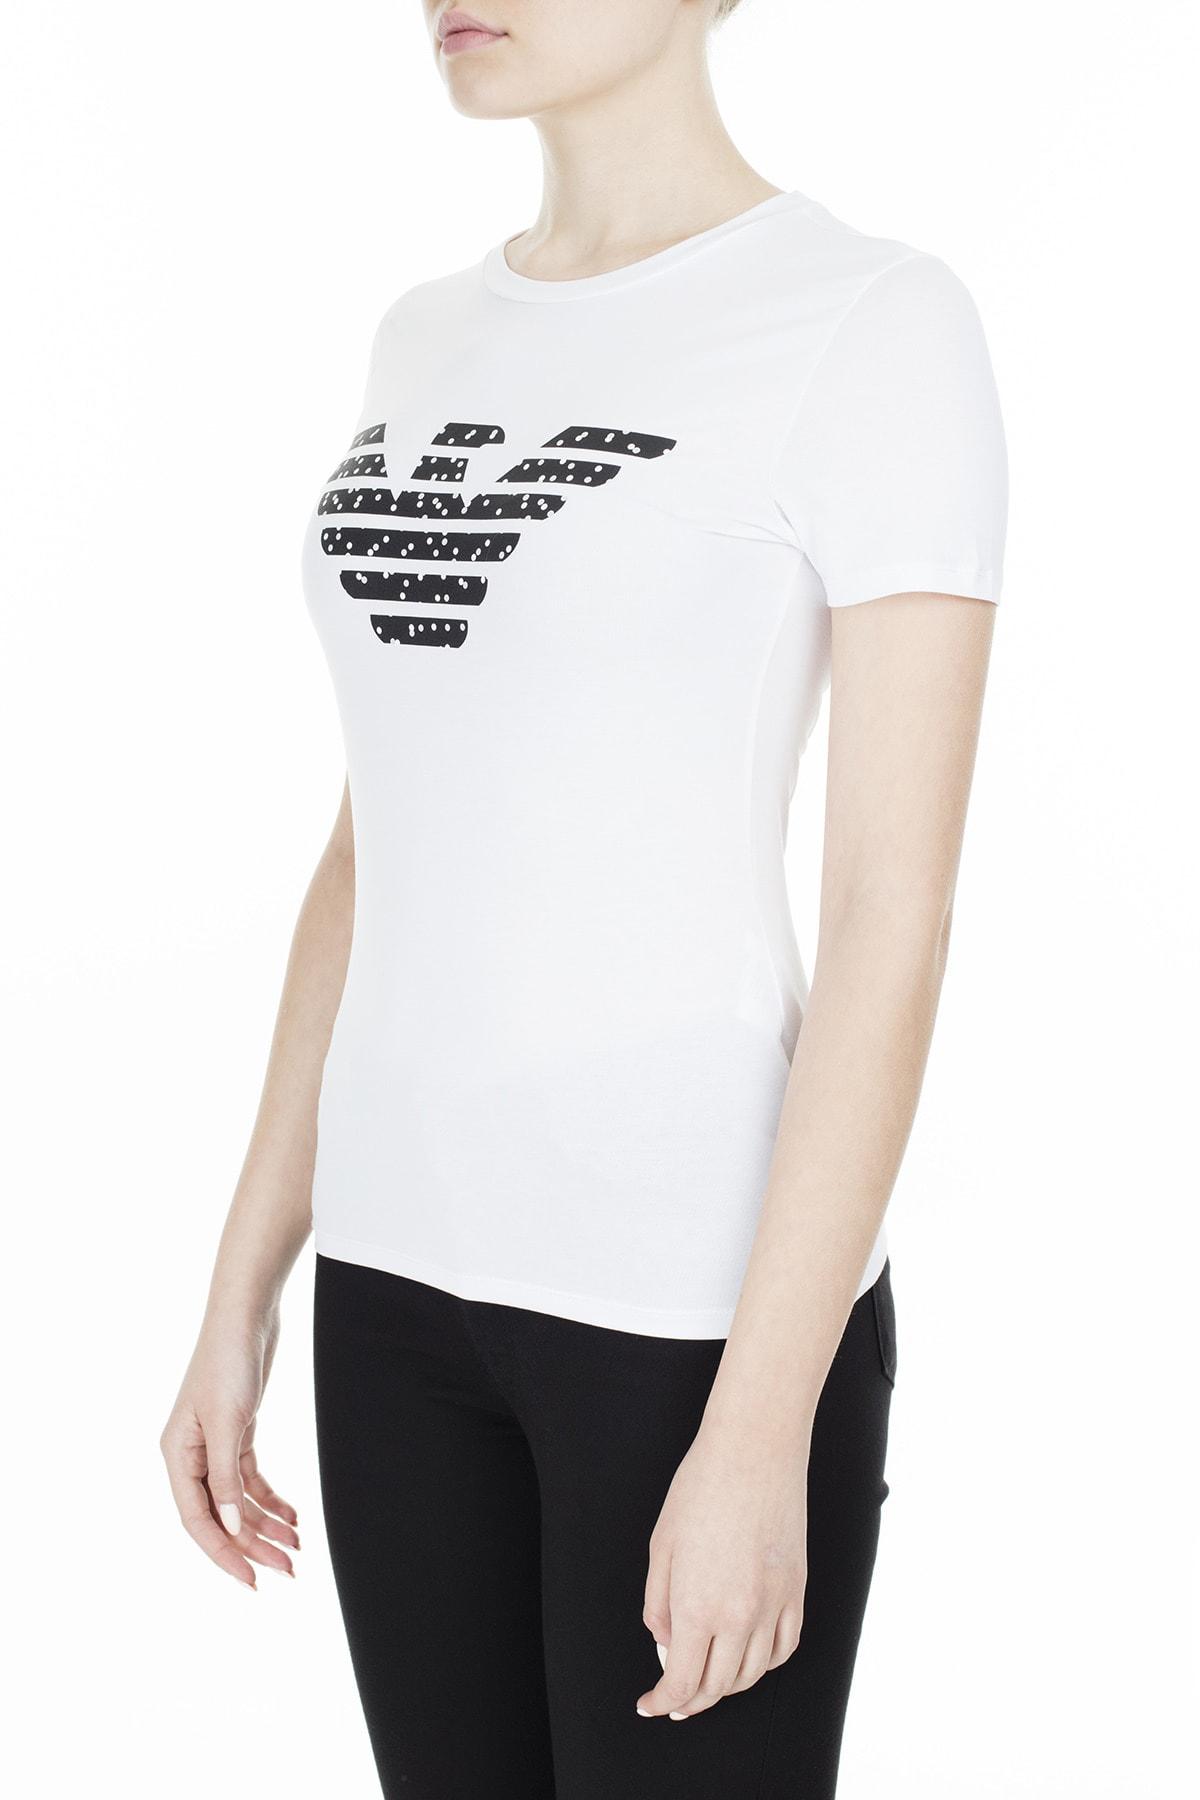 Emporio Armani T Shirt Kadın T Shirt S 6G2T7N 2J07Z 0100 S 6G2T7N 2J07Z 0100 2